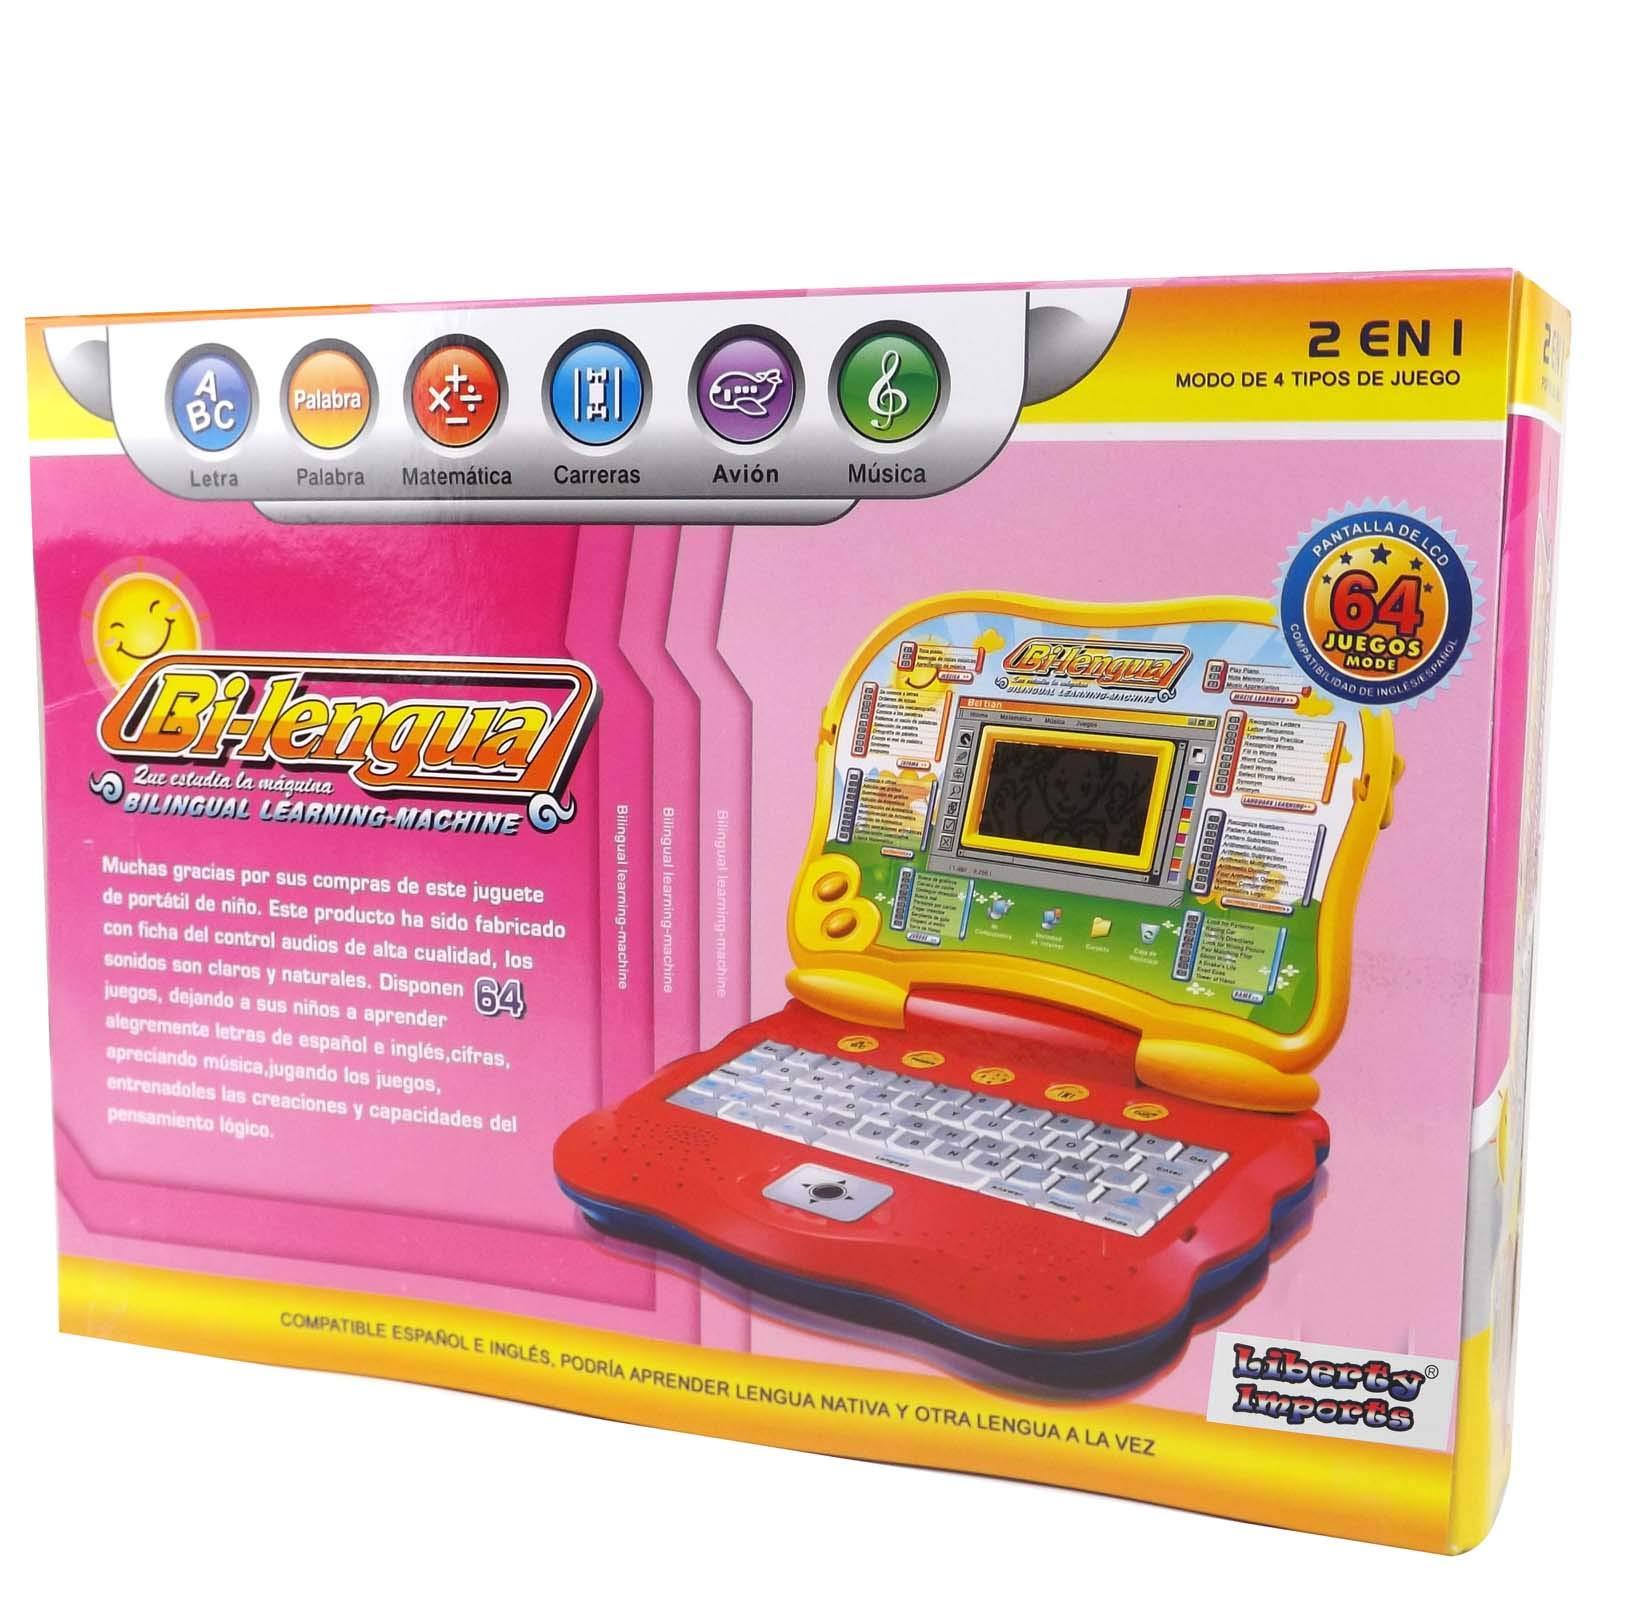 Liberty Imports Bilingual Advanced Learning Children Laptop - English and Spanish (Pink) by Liberty Imports (Image #5)